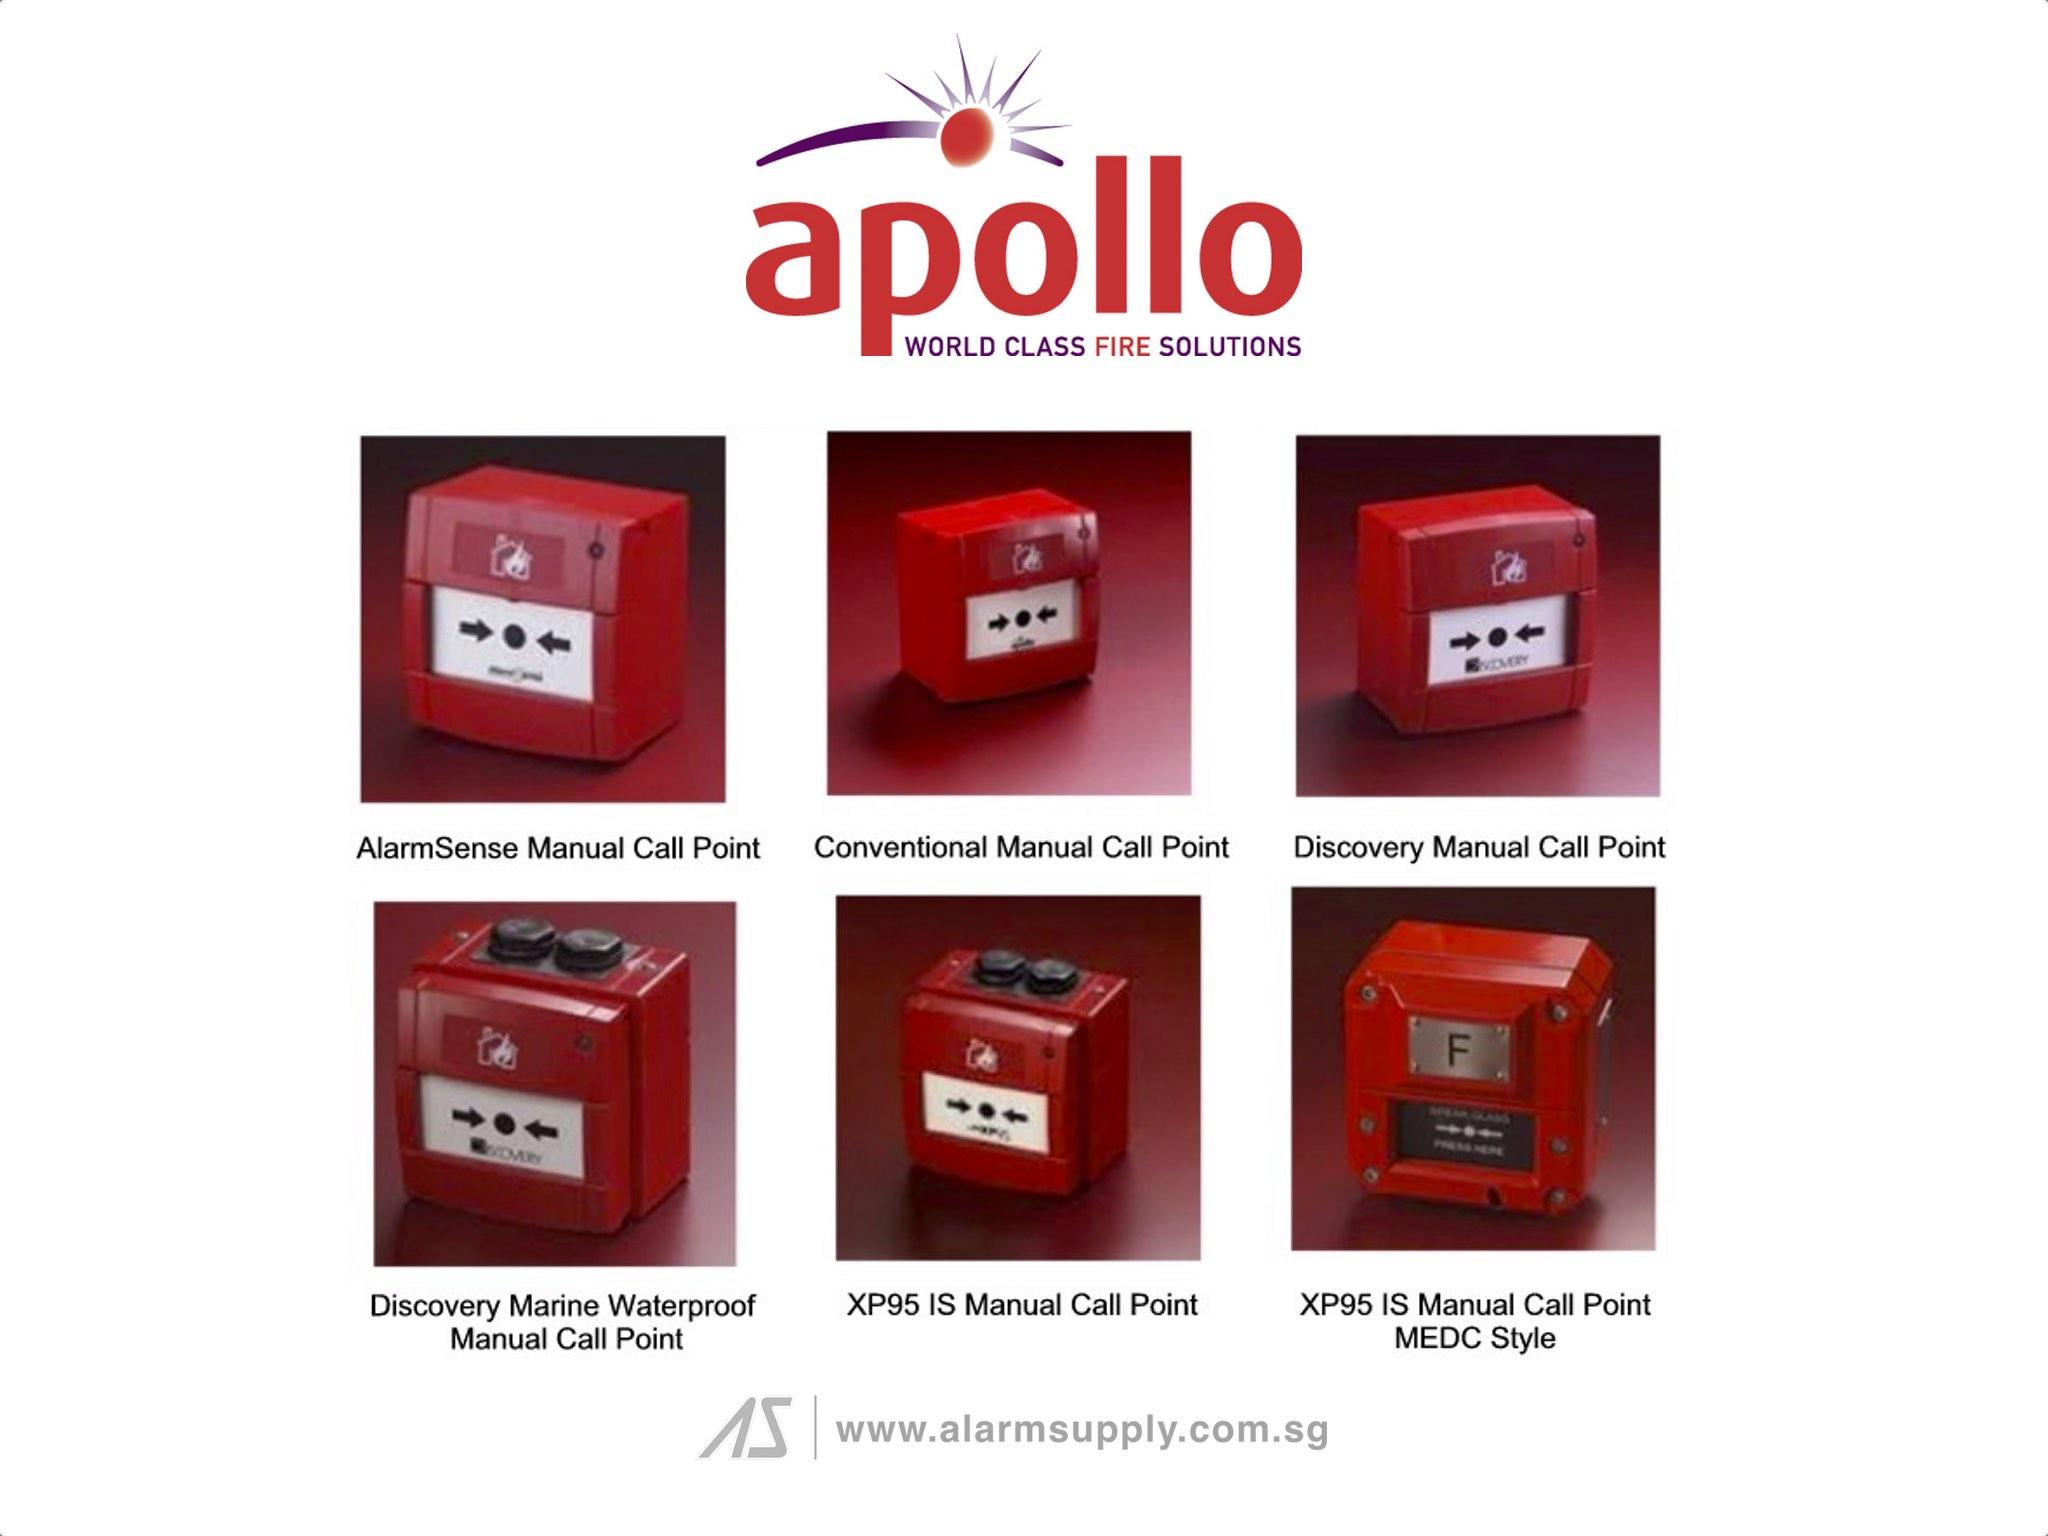 Apollo Orbis Smoke Detector Wiring Diagram 42 Class A Fire Alarm Callpoint Supply Pte Ltd Detectors Limited